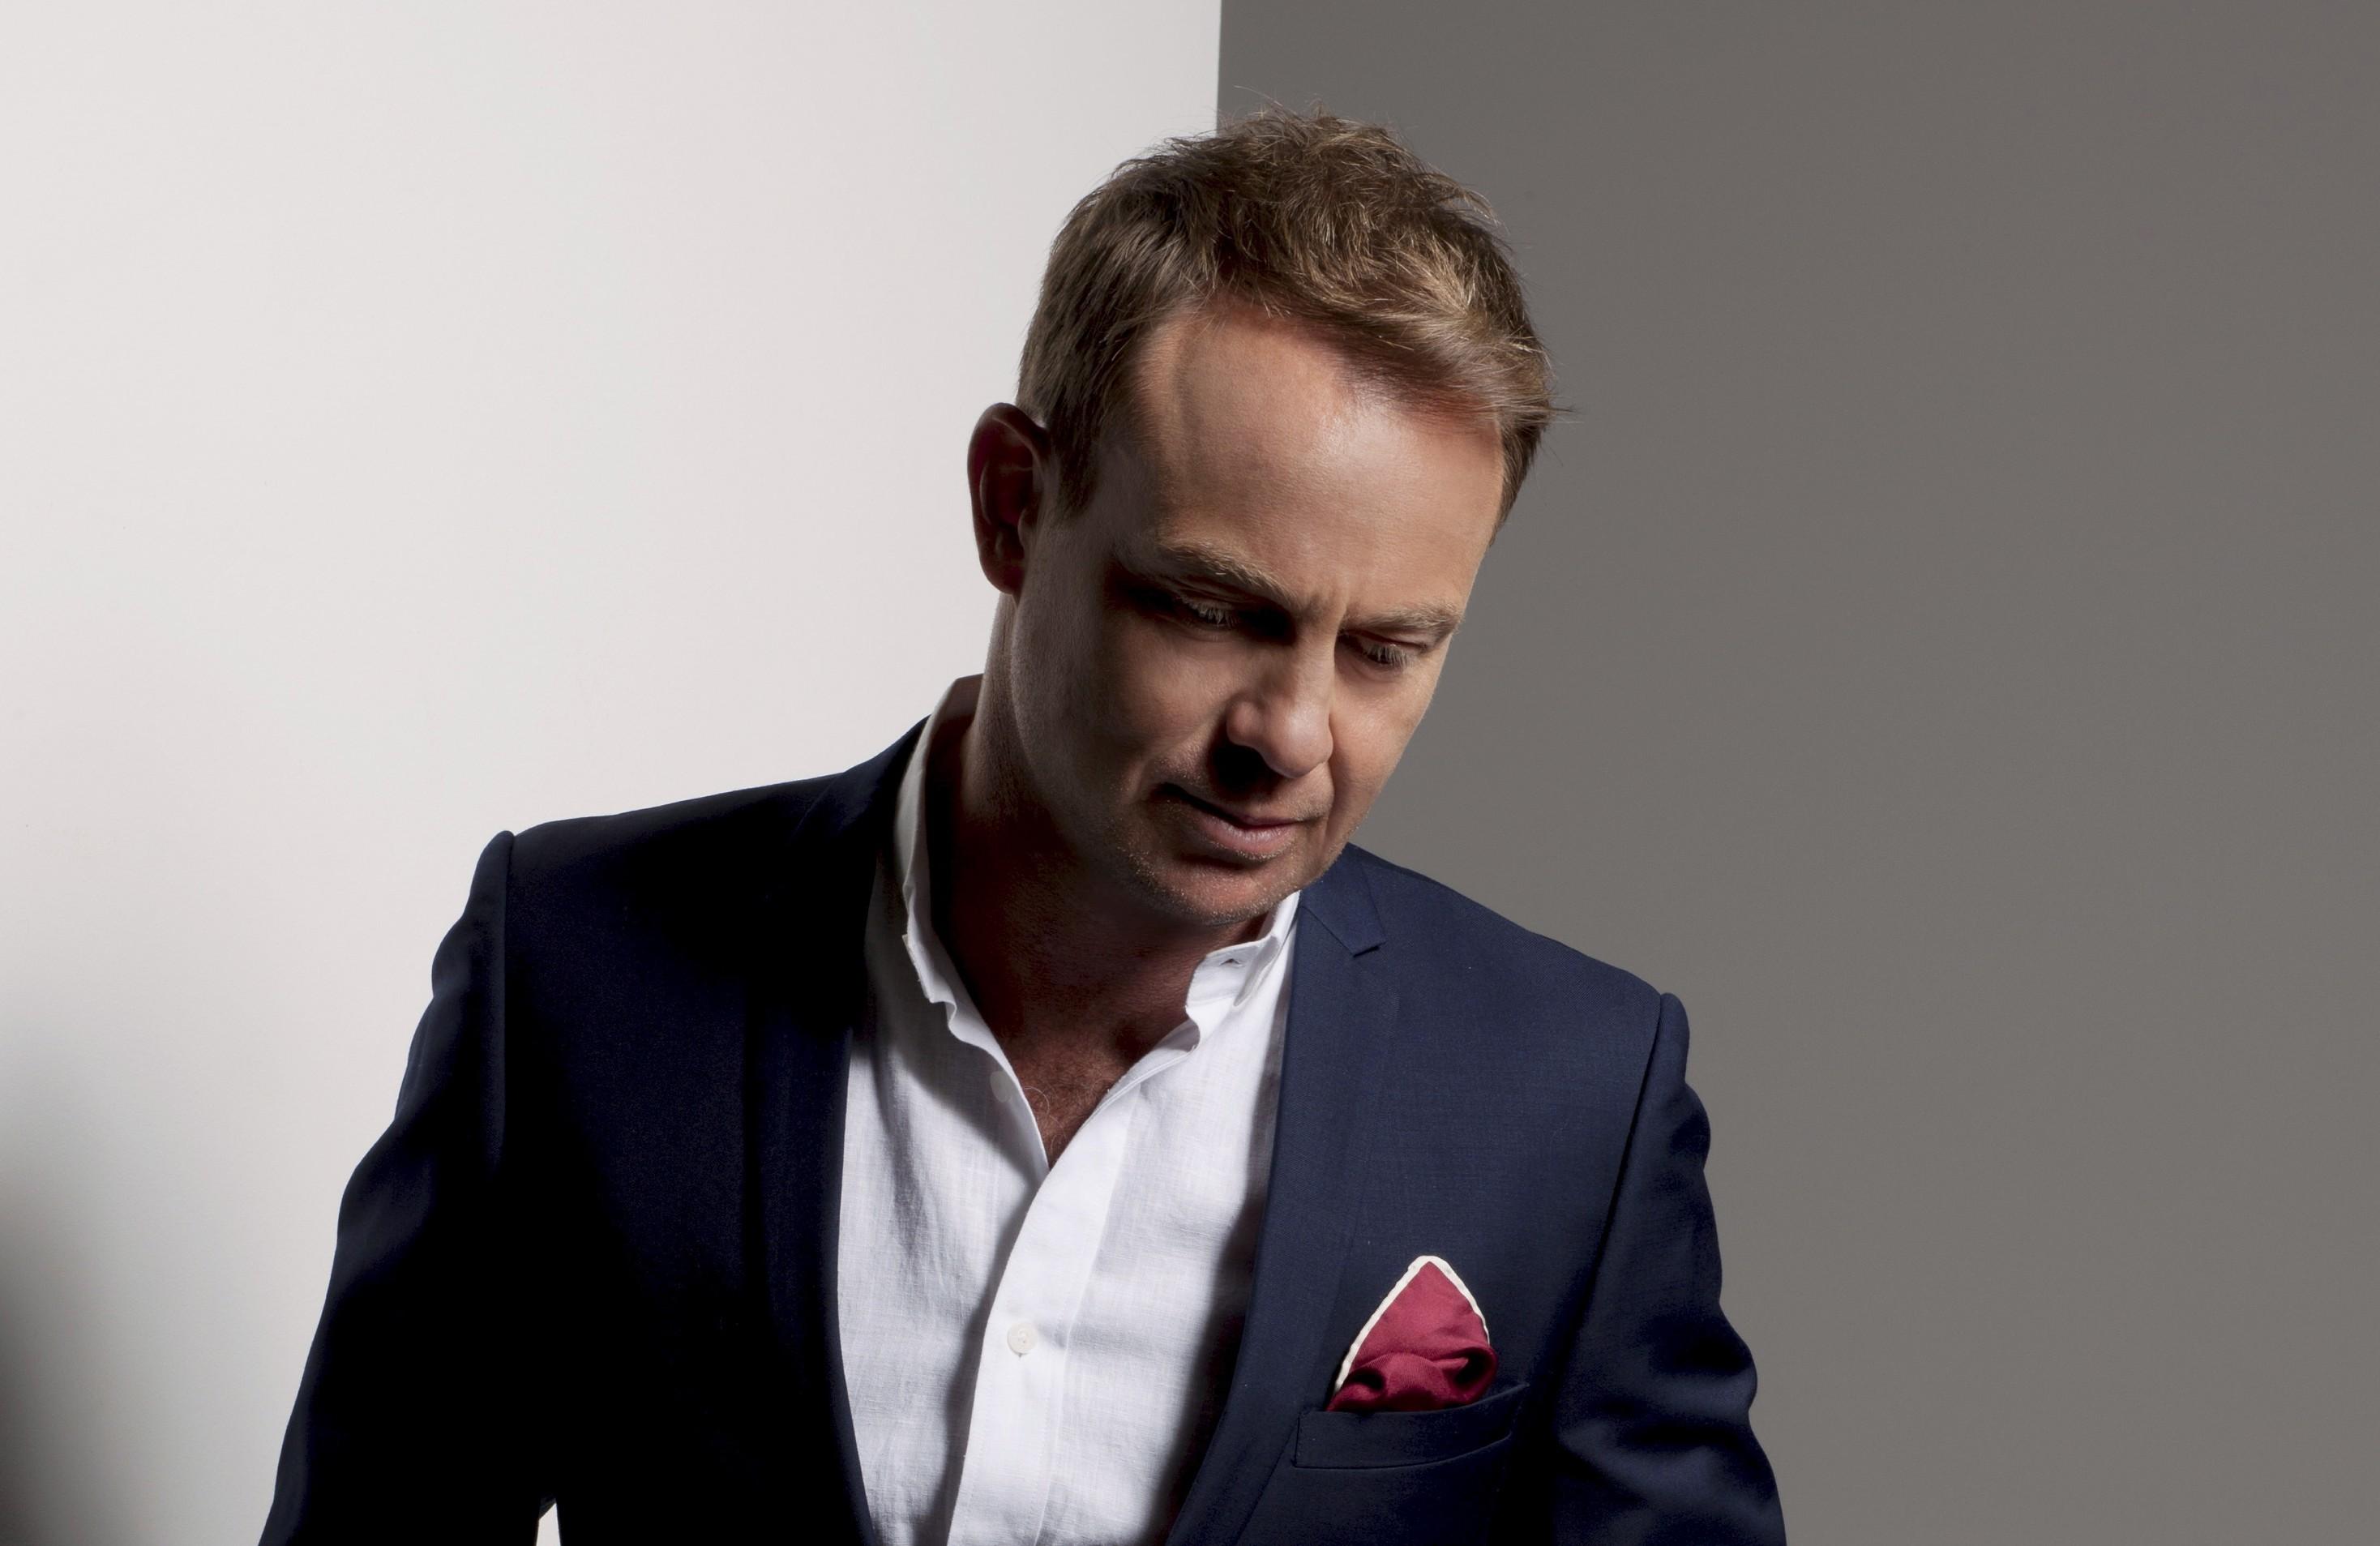 Jason Donovan will perform at the Music Hall